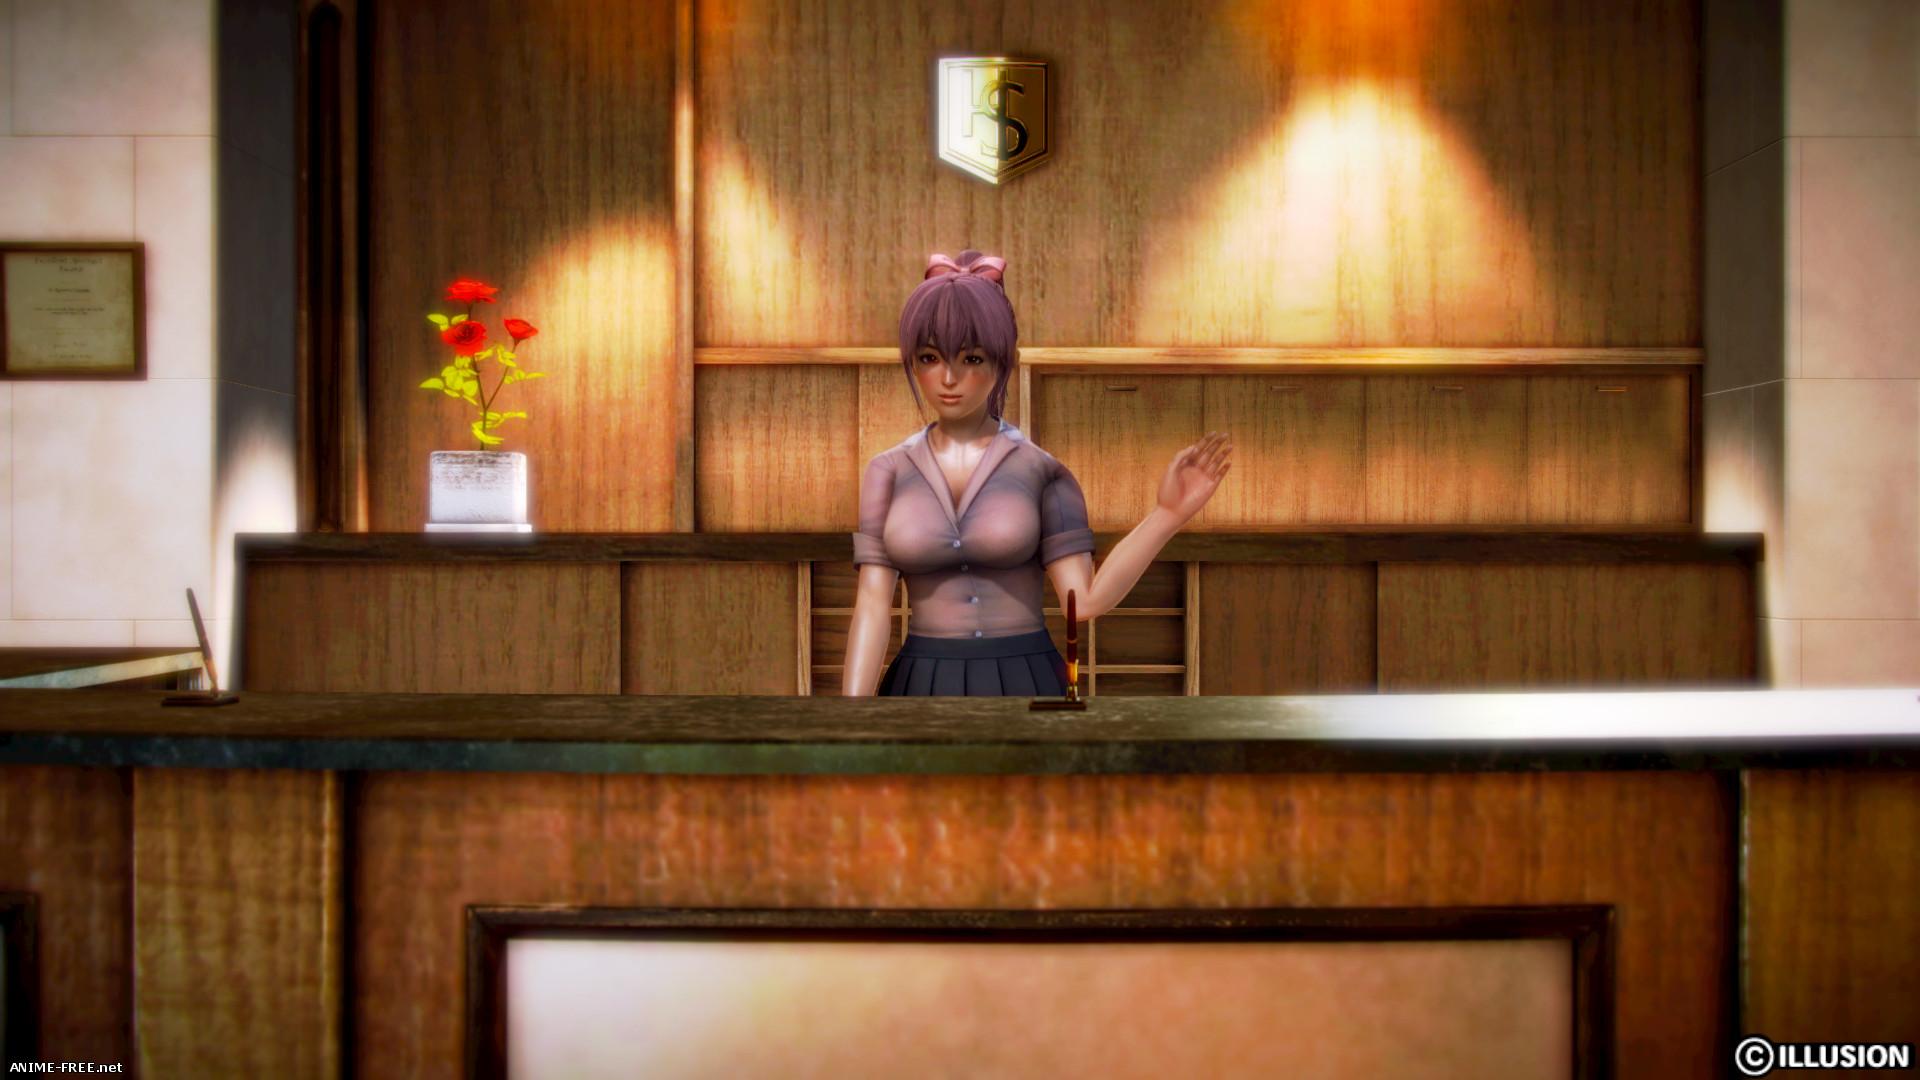 Dream Hotel [2019] [Uncen] [ADV, 3DCG, Animation] [ENG] H-Game